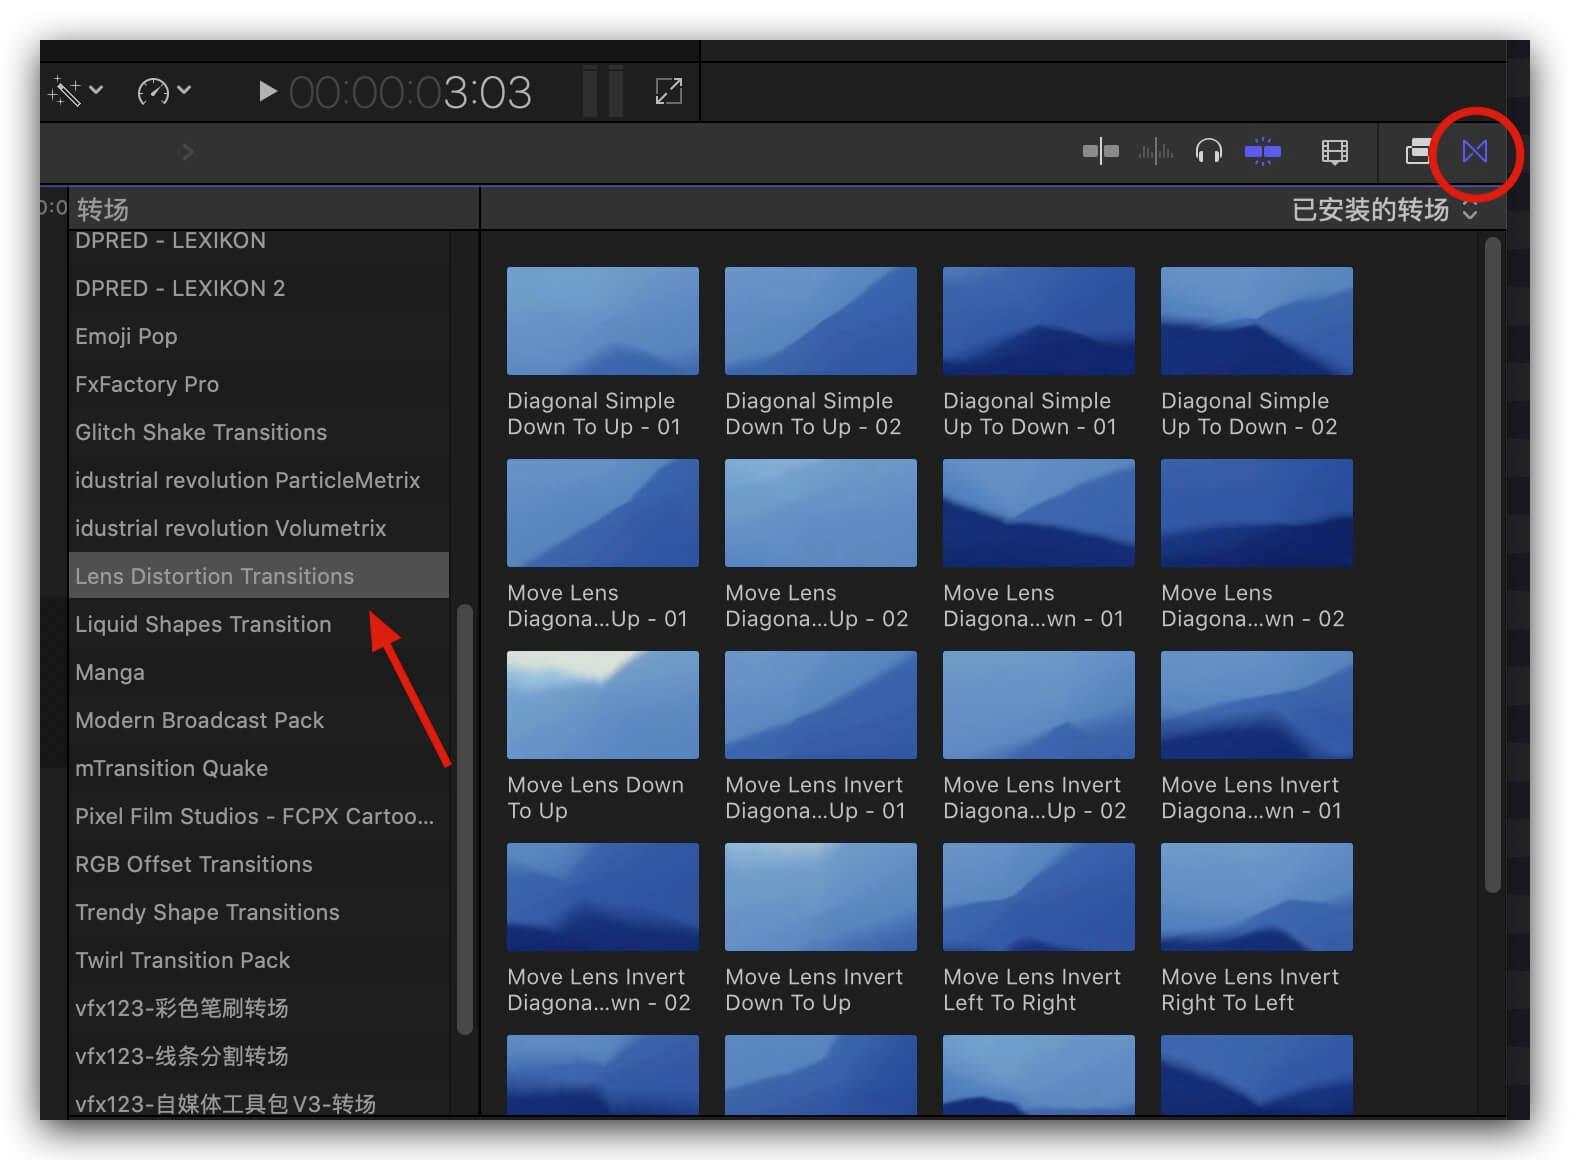 fcpx插件 24组镜头变形效果过渡转场 Lens Distortion Transitions